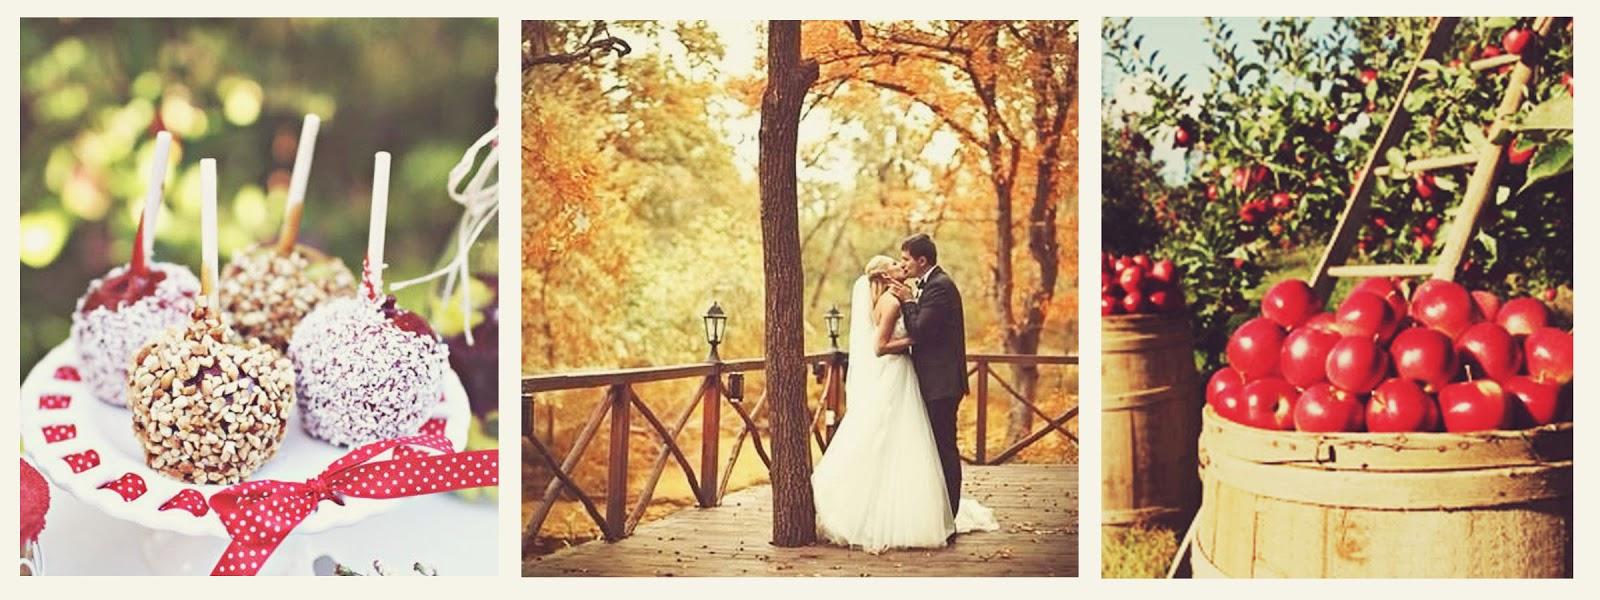 Something borrowed autumn weddings apple orchard wedding venues